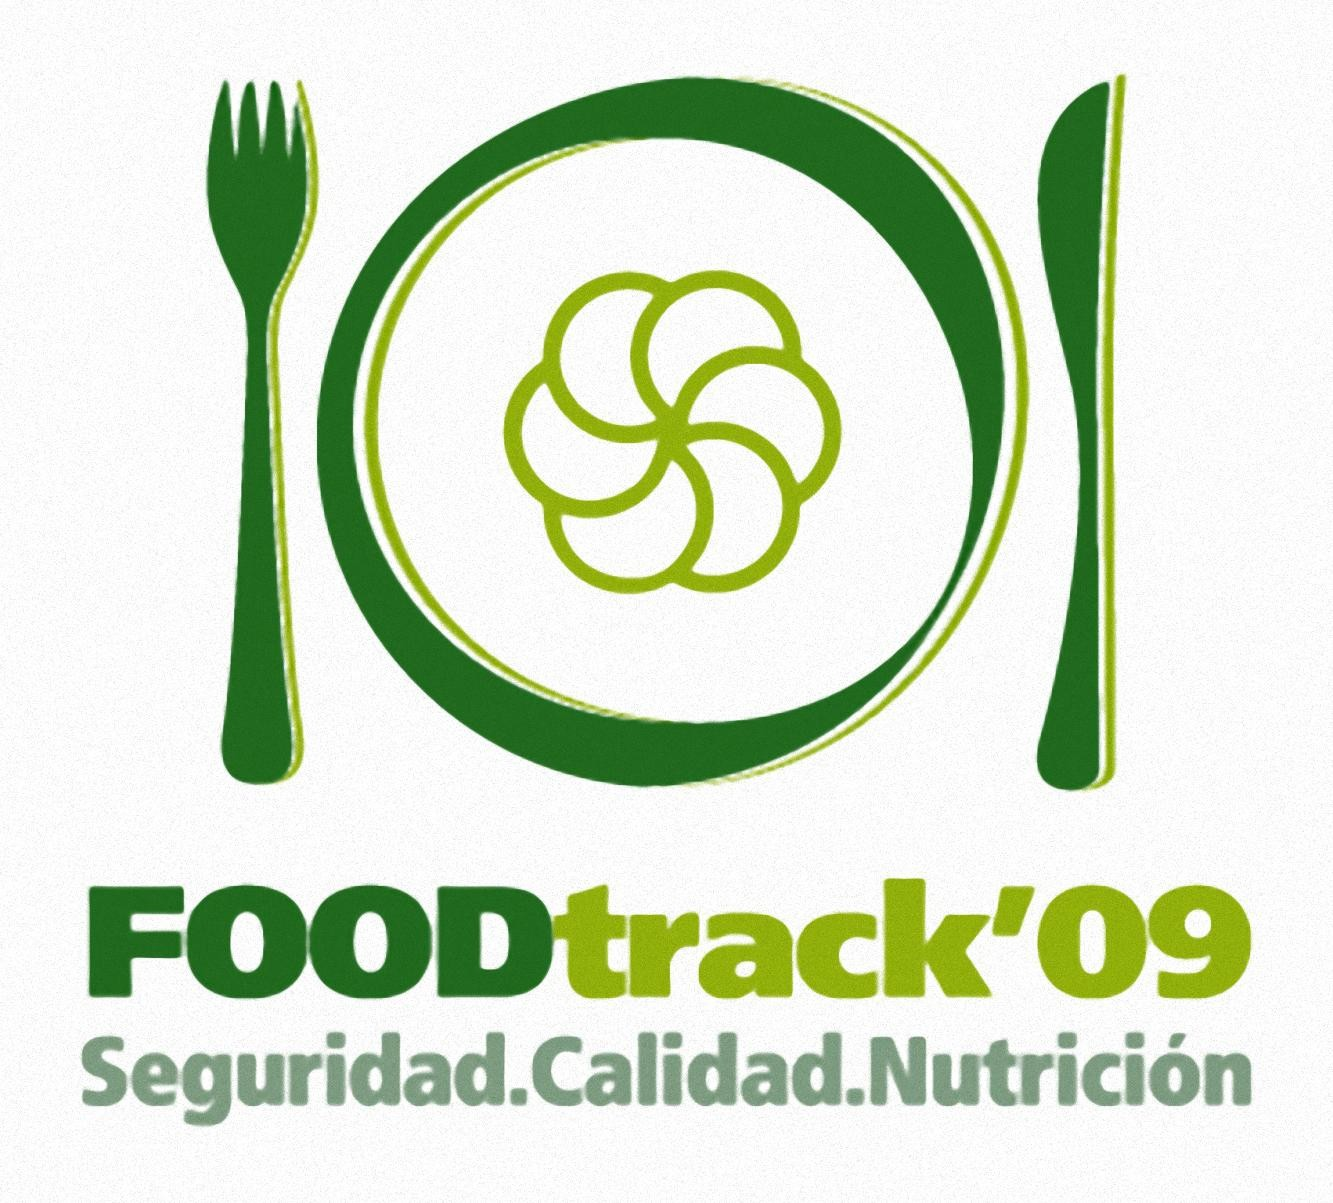 FOODtrack'09